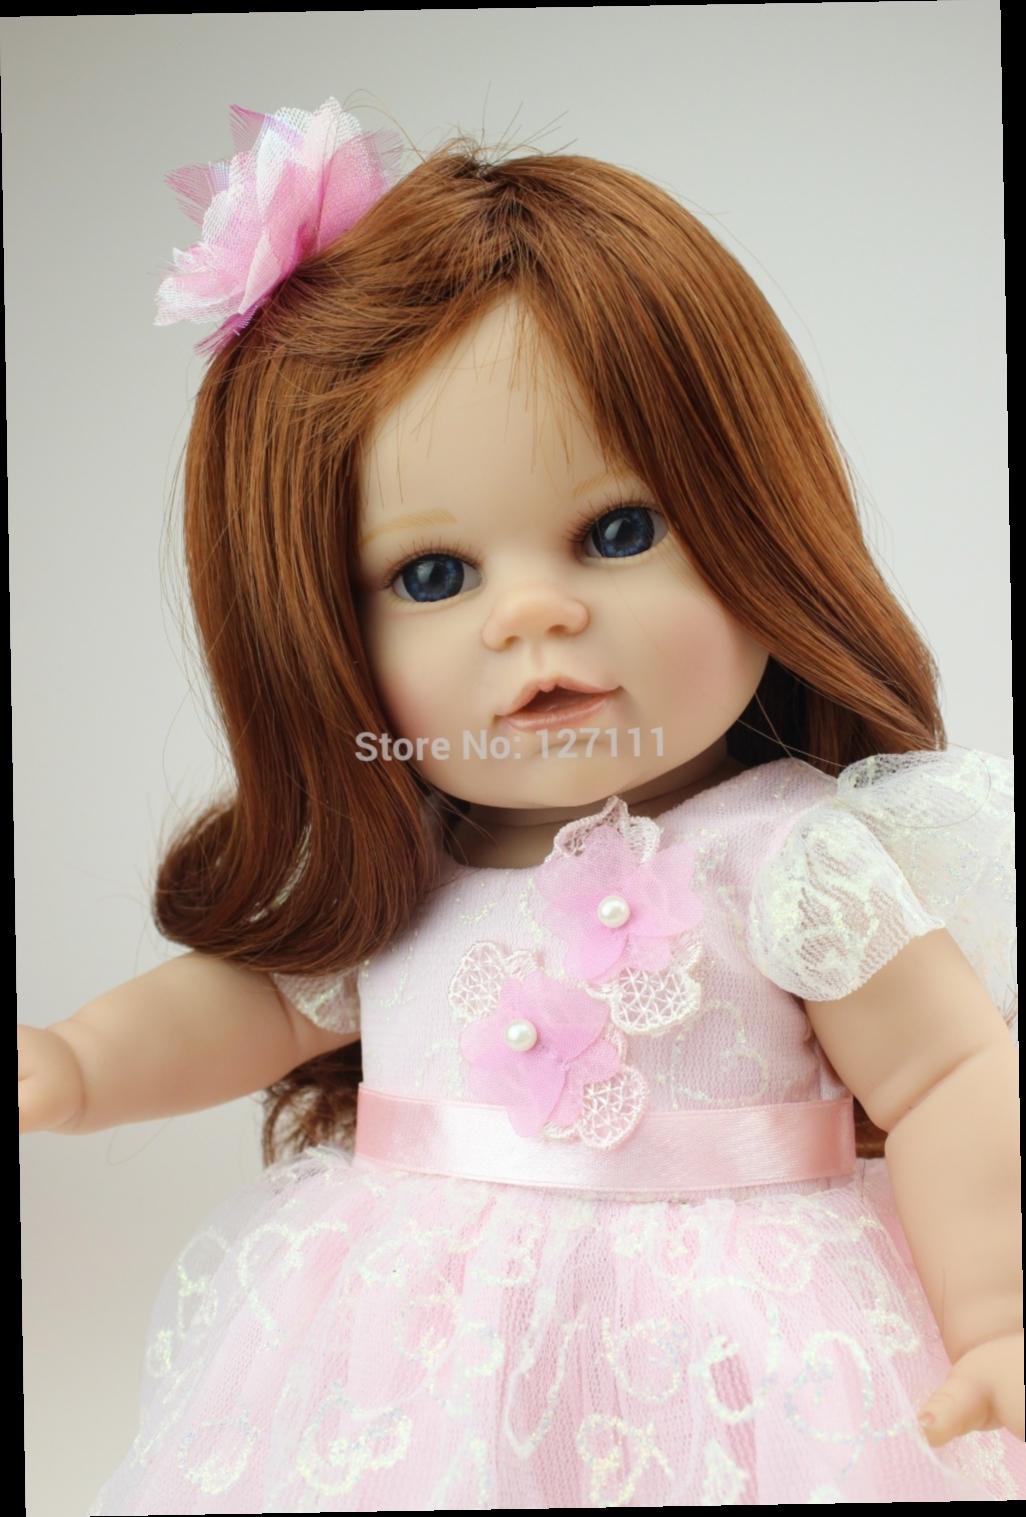 51.90$  Watch here - http://alikvk.worldwells.pw/go.php?t=32274207924 - New Boneca baby alive 18 inch girl dolls with fashion dress girl birthday gift Valentine's Day American dolls brinquedos meninas